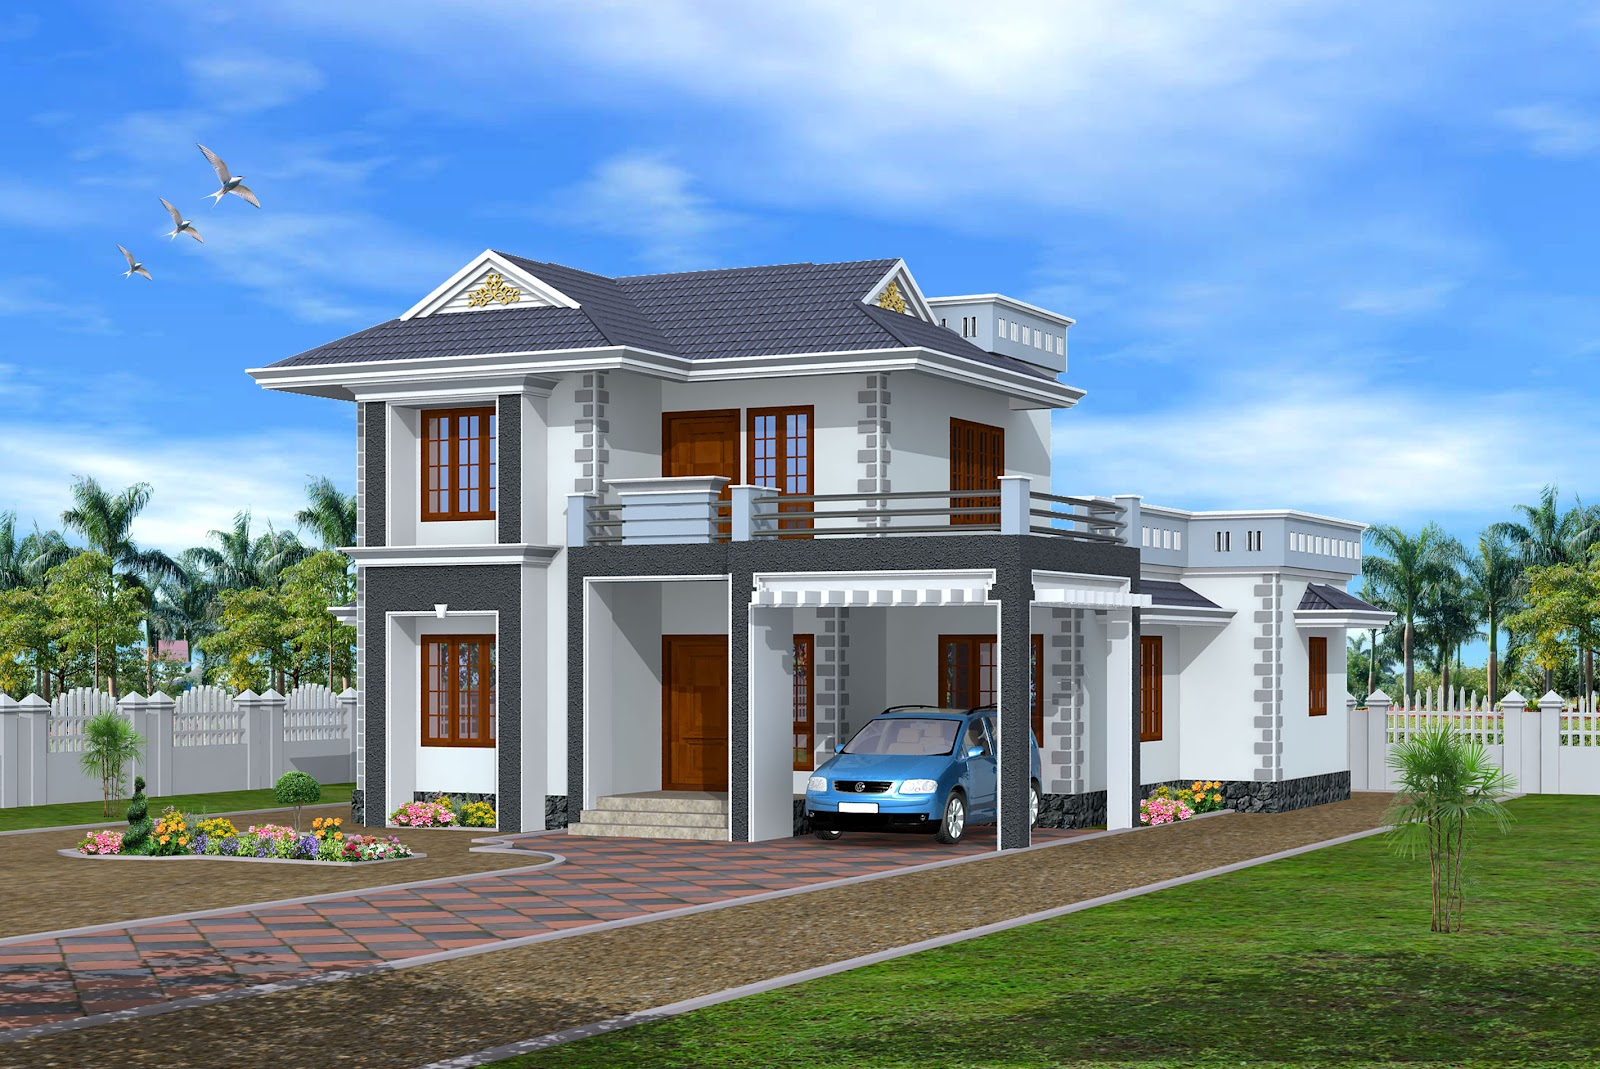 New Home Designs Latest.: Modern Homes Exterior Designs Views